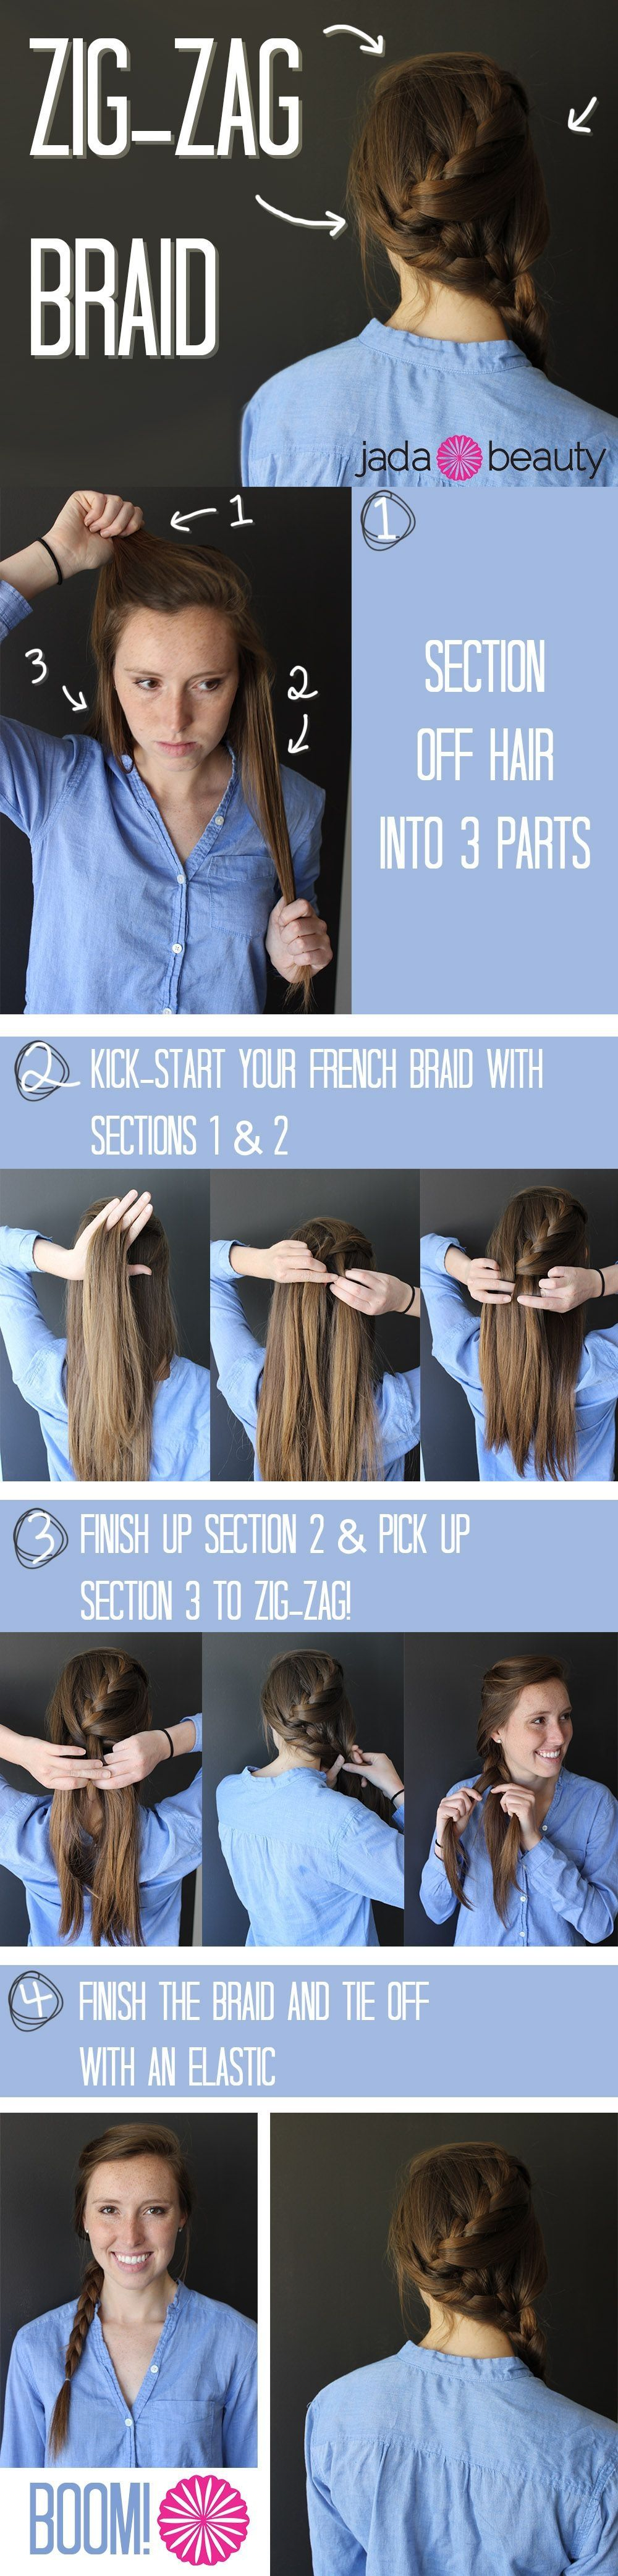 So cute hair ideas pinterest creative the back and softball